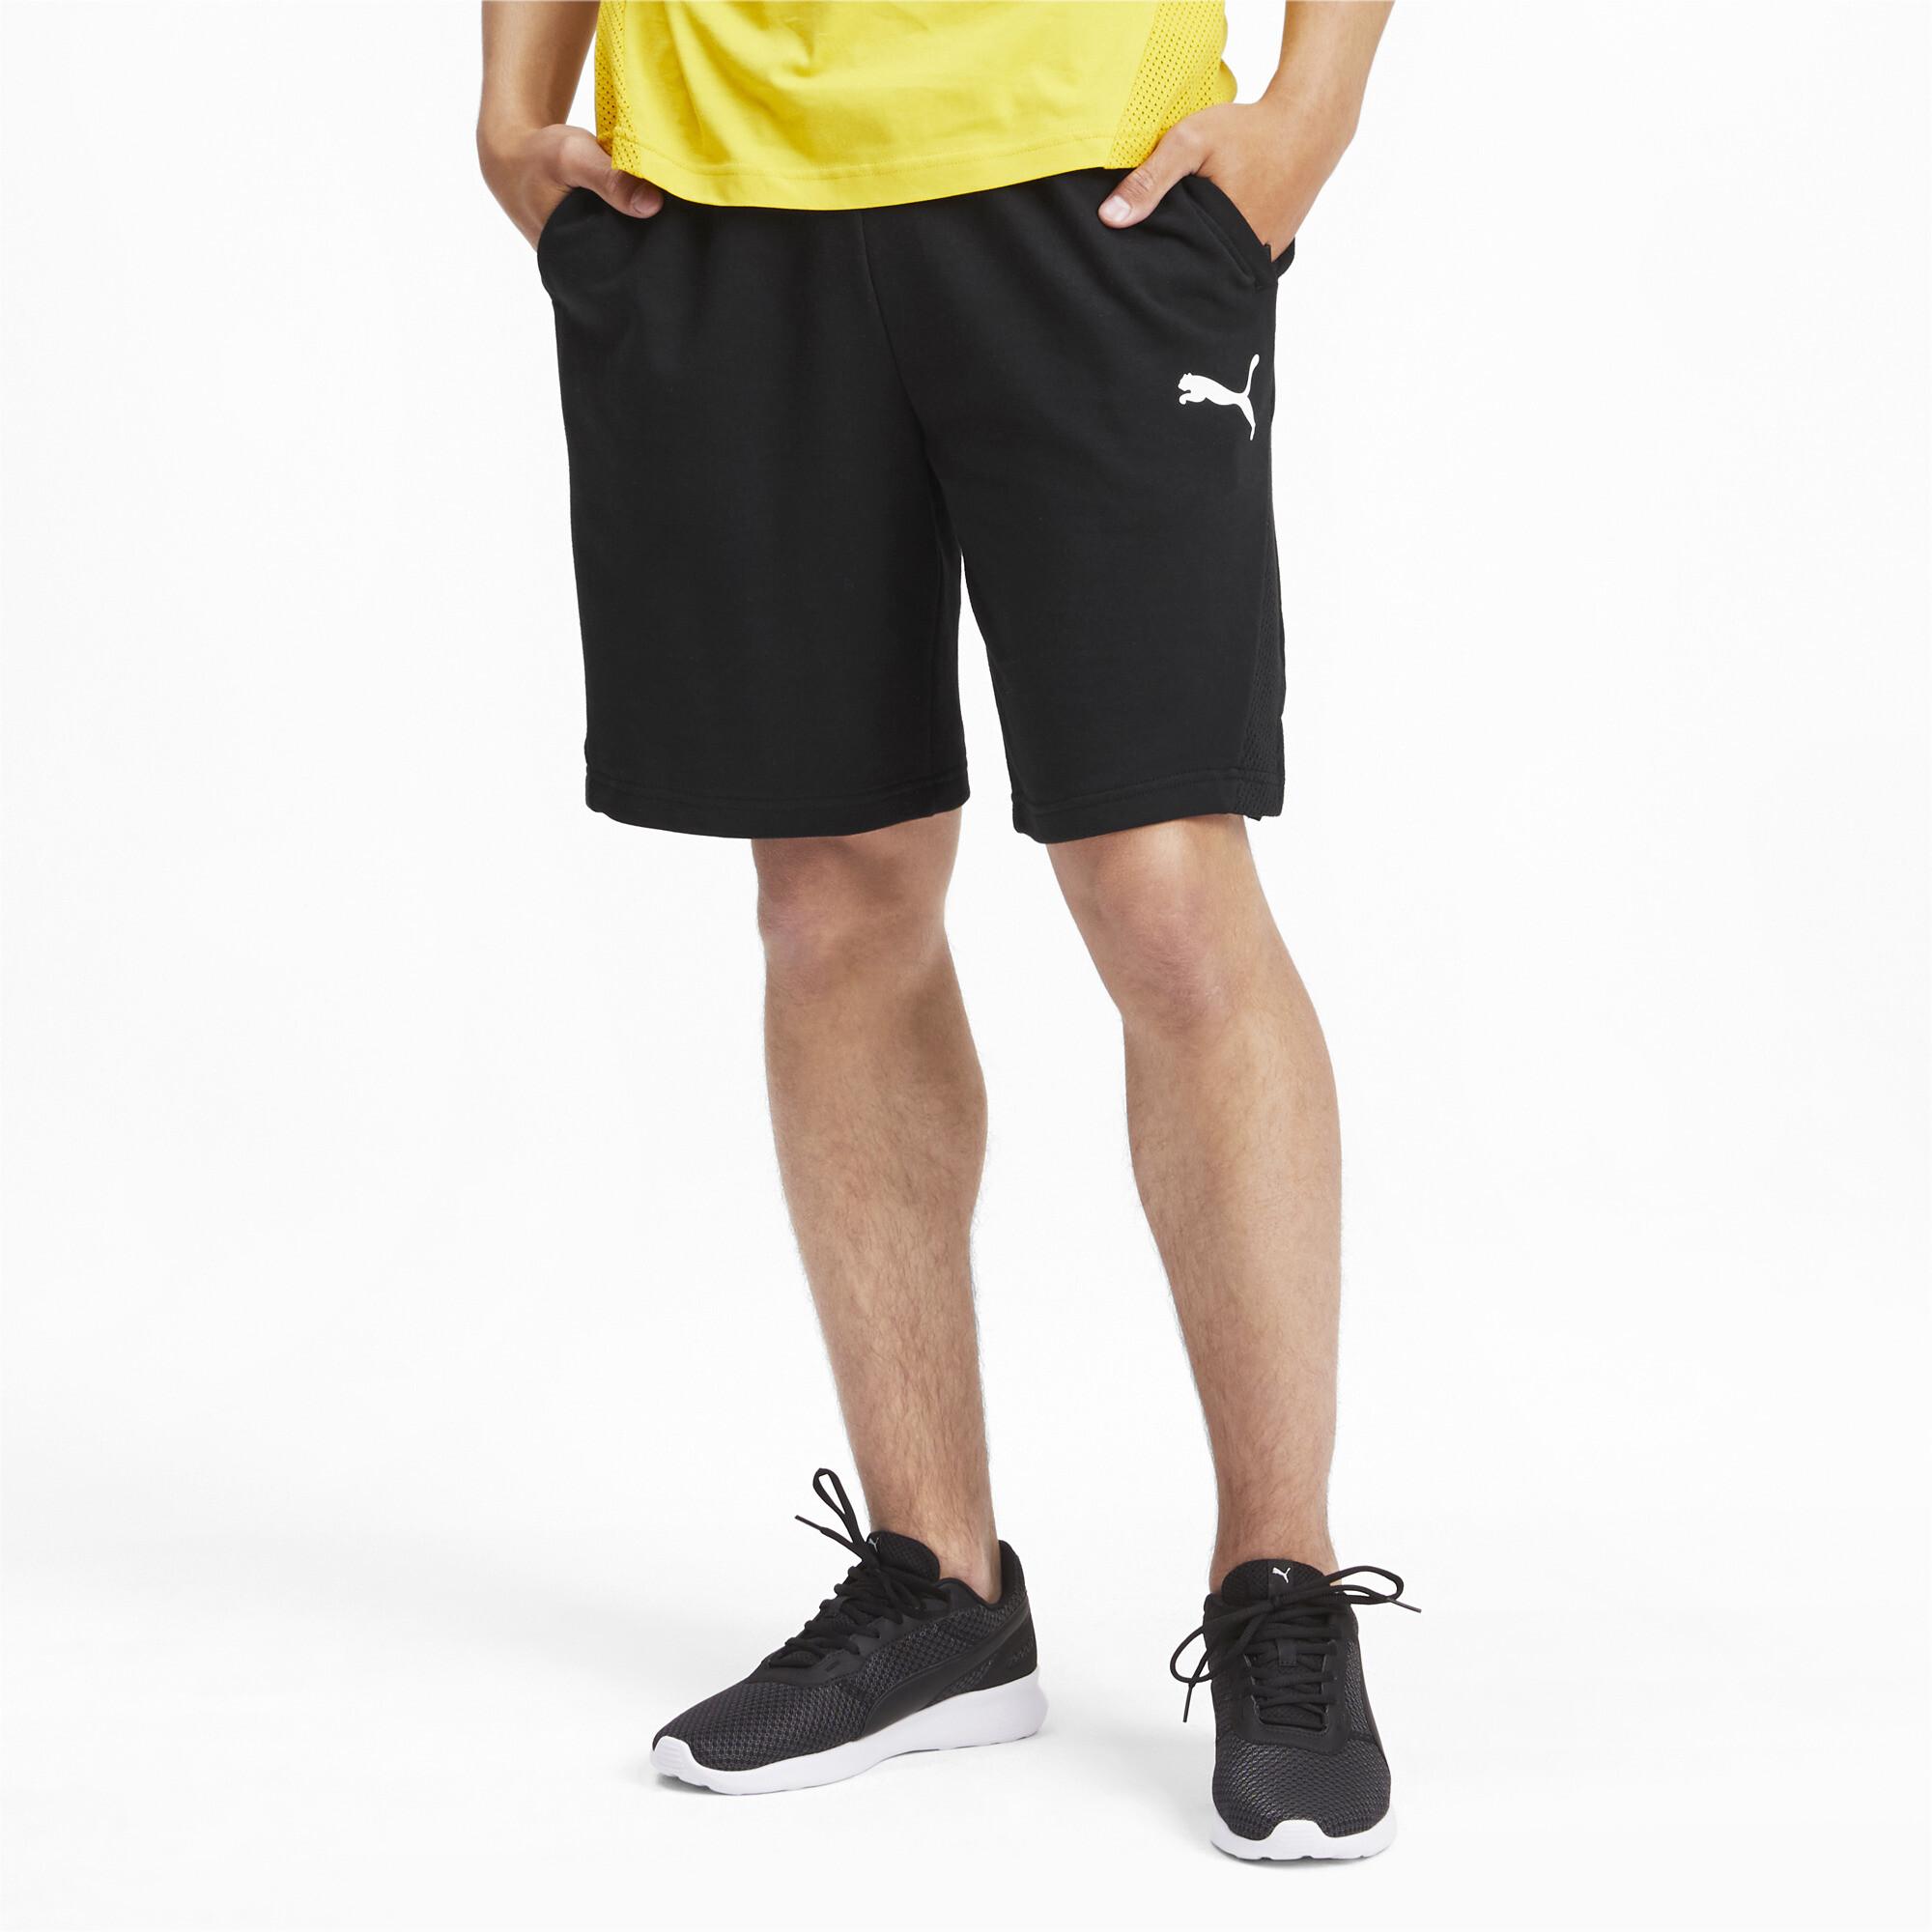 PUMA-Modern-Sports-Men-039-s-Shorts-Men-Knitted-Shorts-Basics thumbnail 4